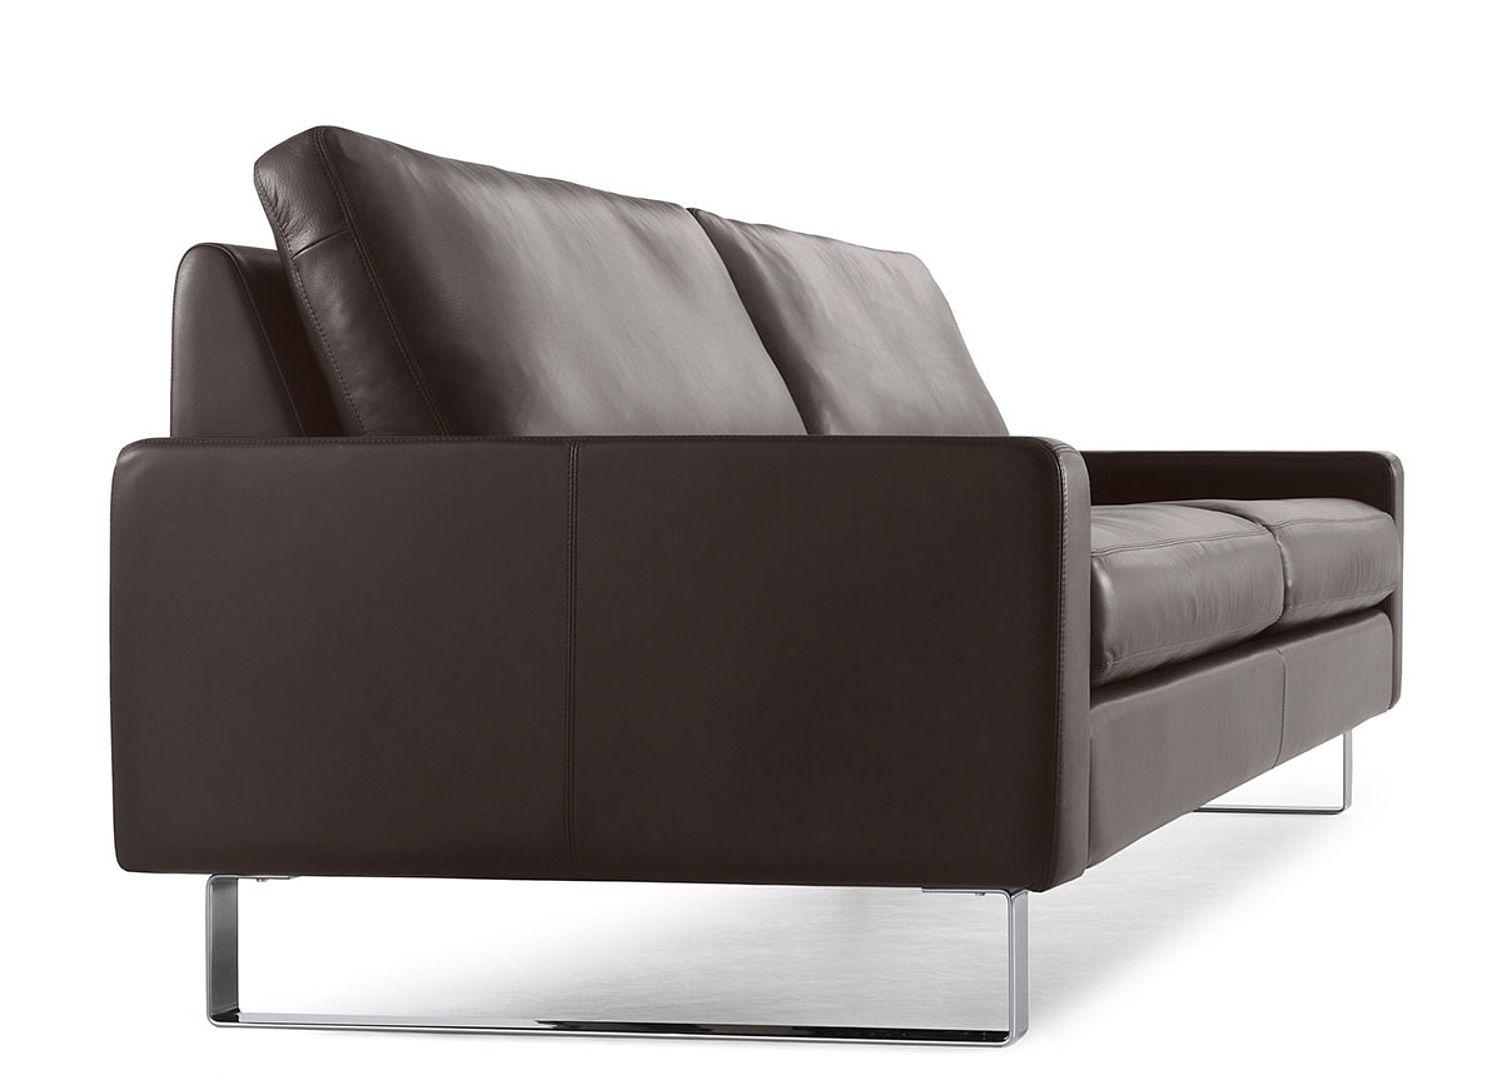 Name: Conseta sofa / Manufacturer: COR | Sofas | Pinterest | Sofa ...